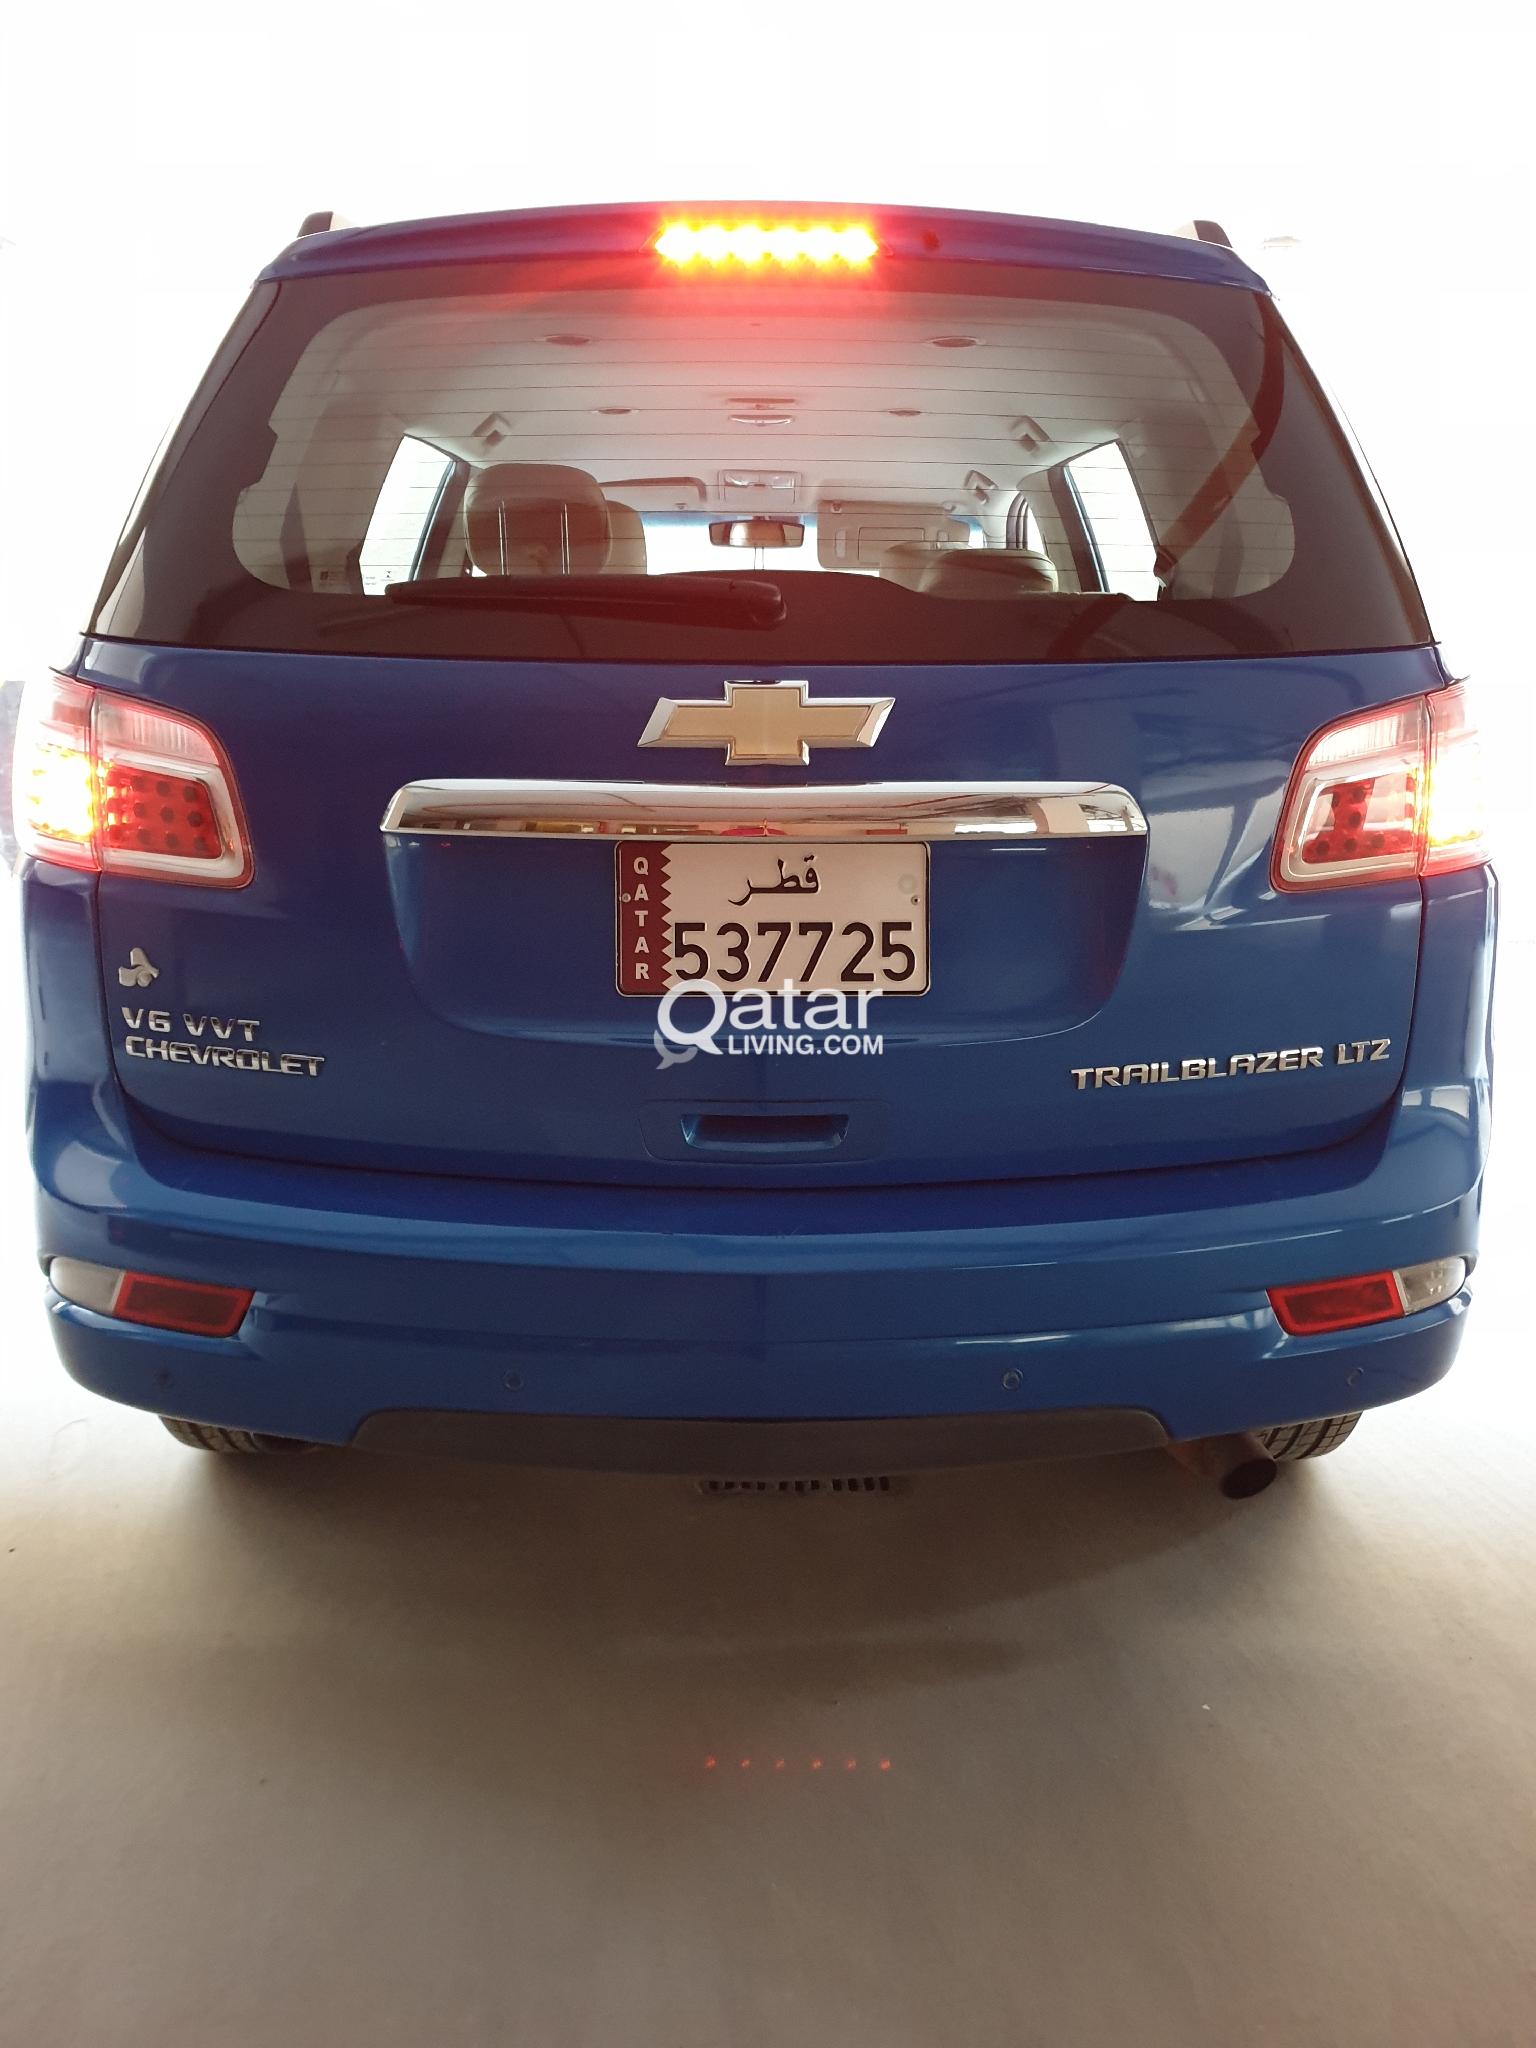 Chevrolet trailblazer LTZ 2013 low kms urgent sale